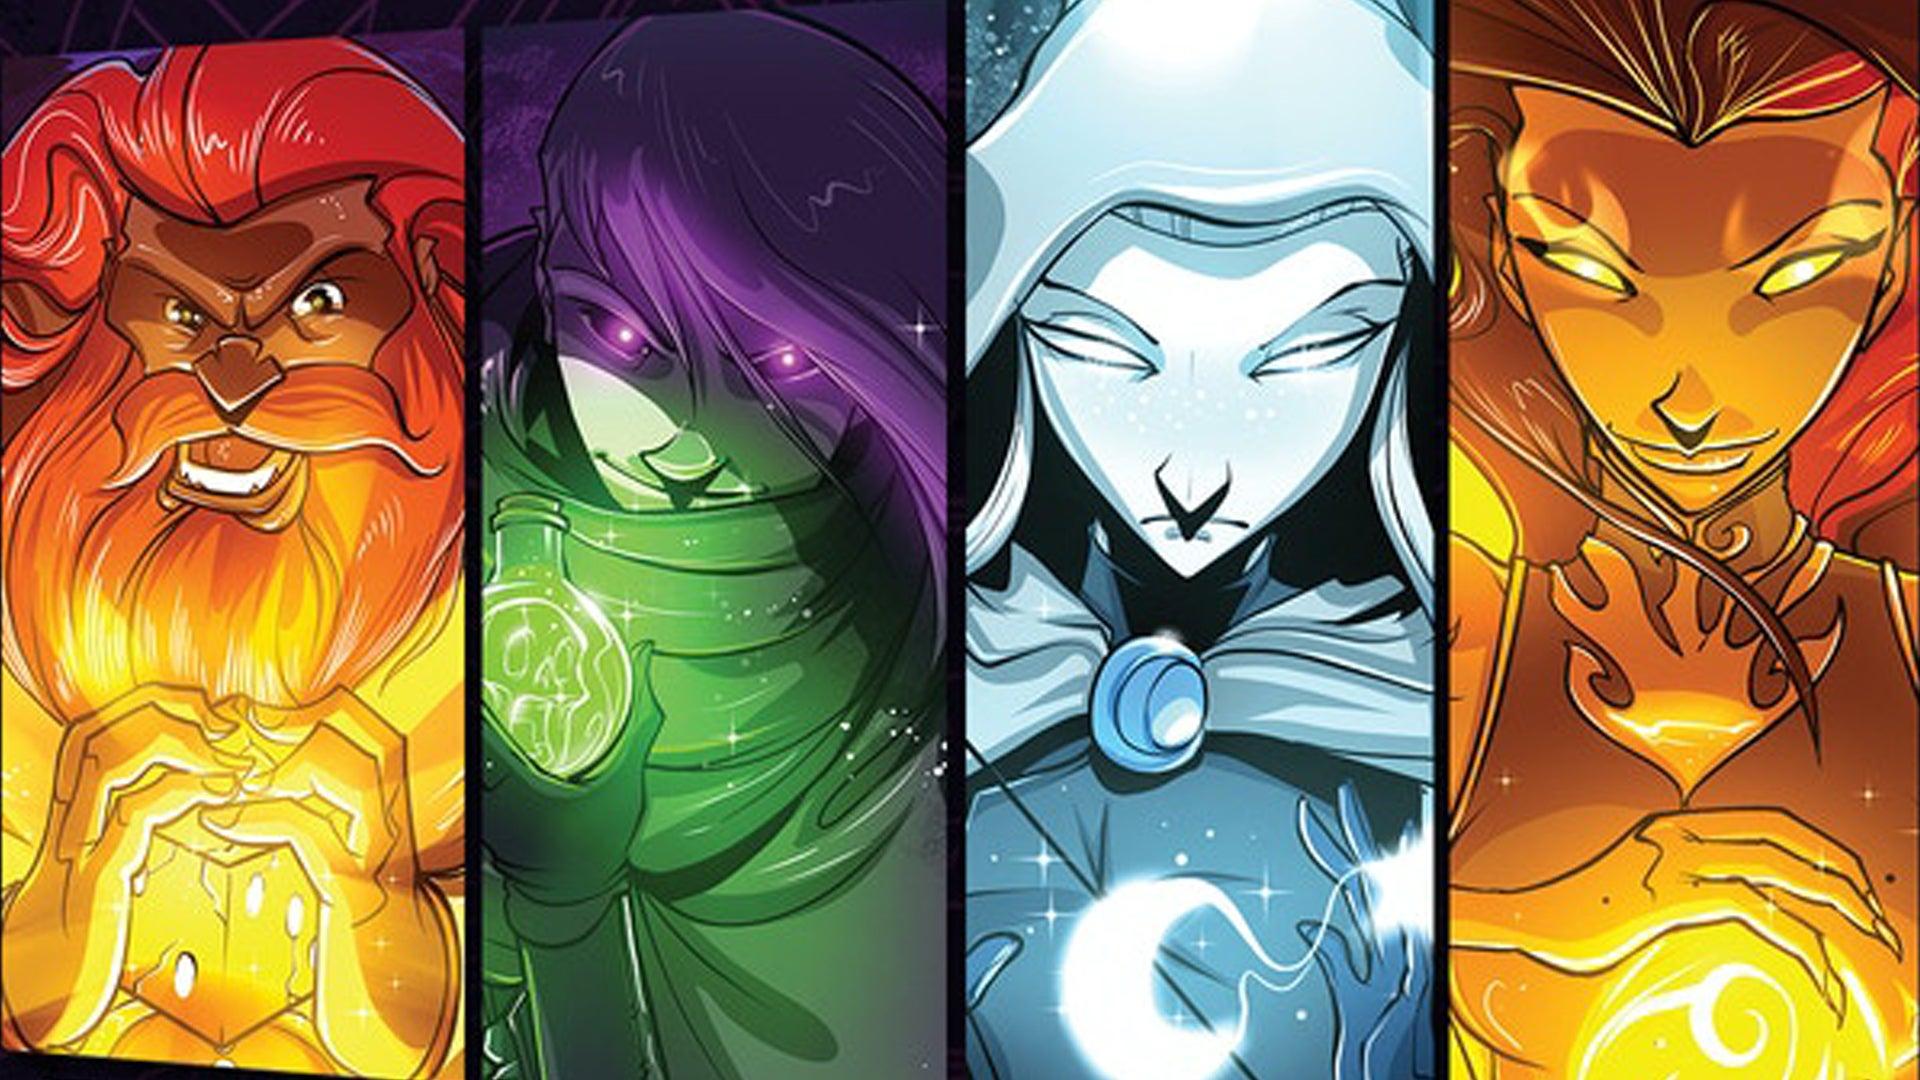 dice-throne-roster-art.jpg